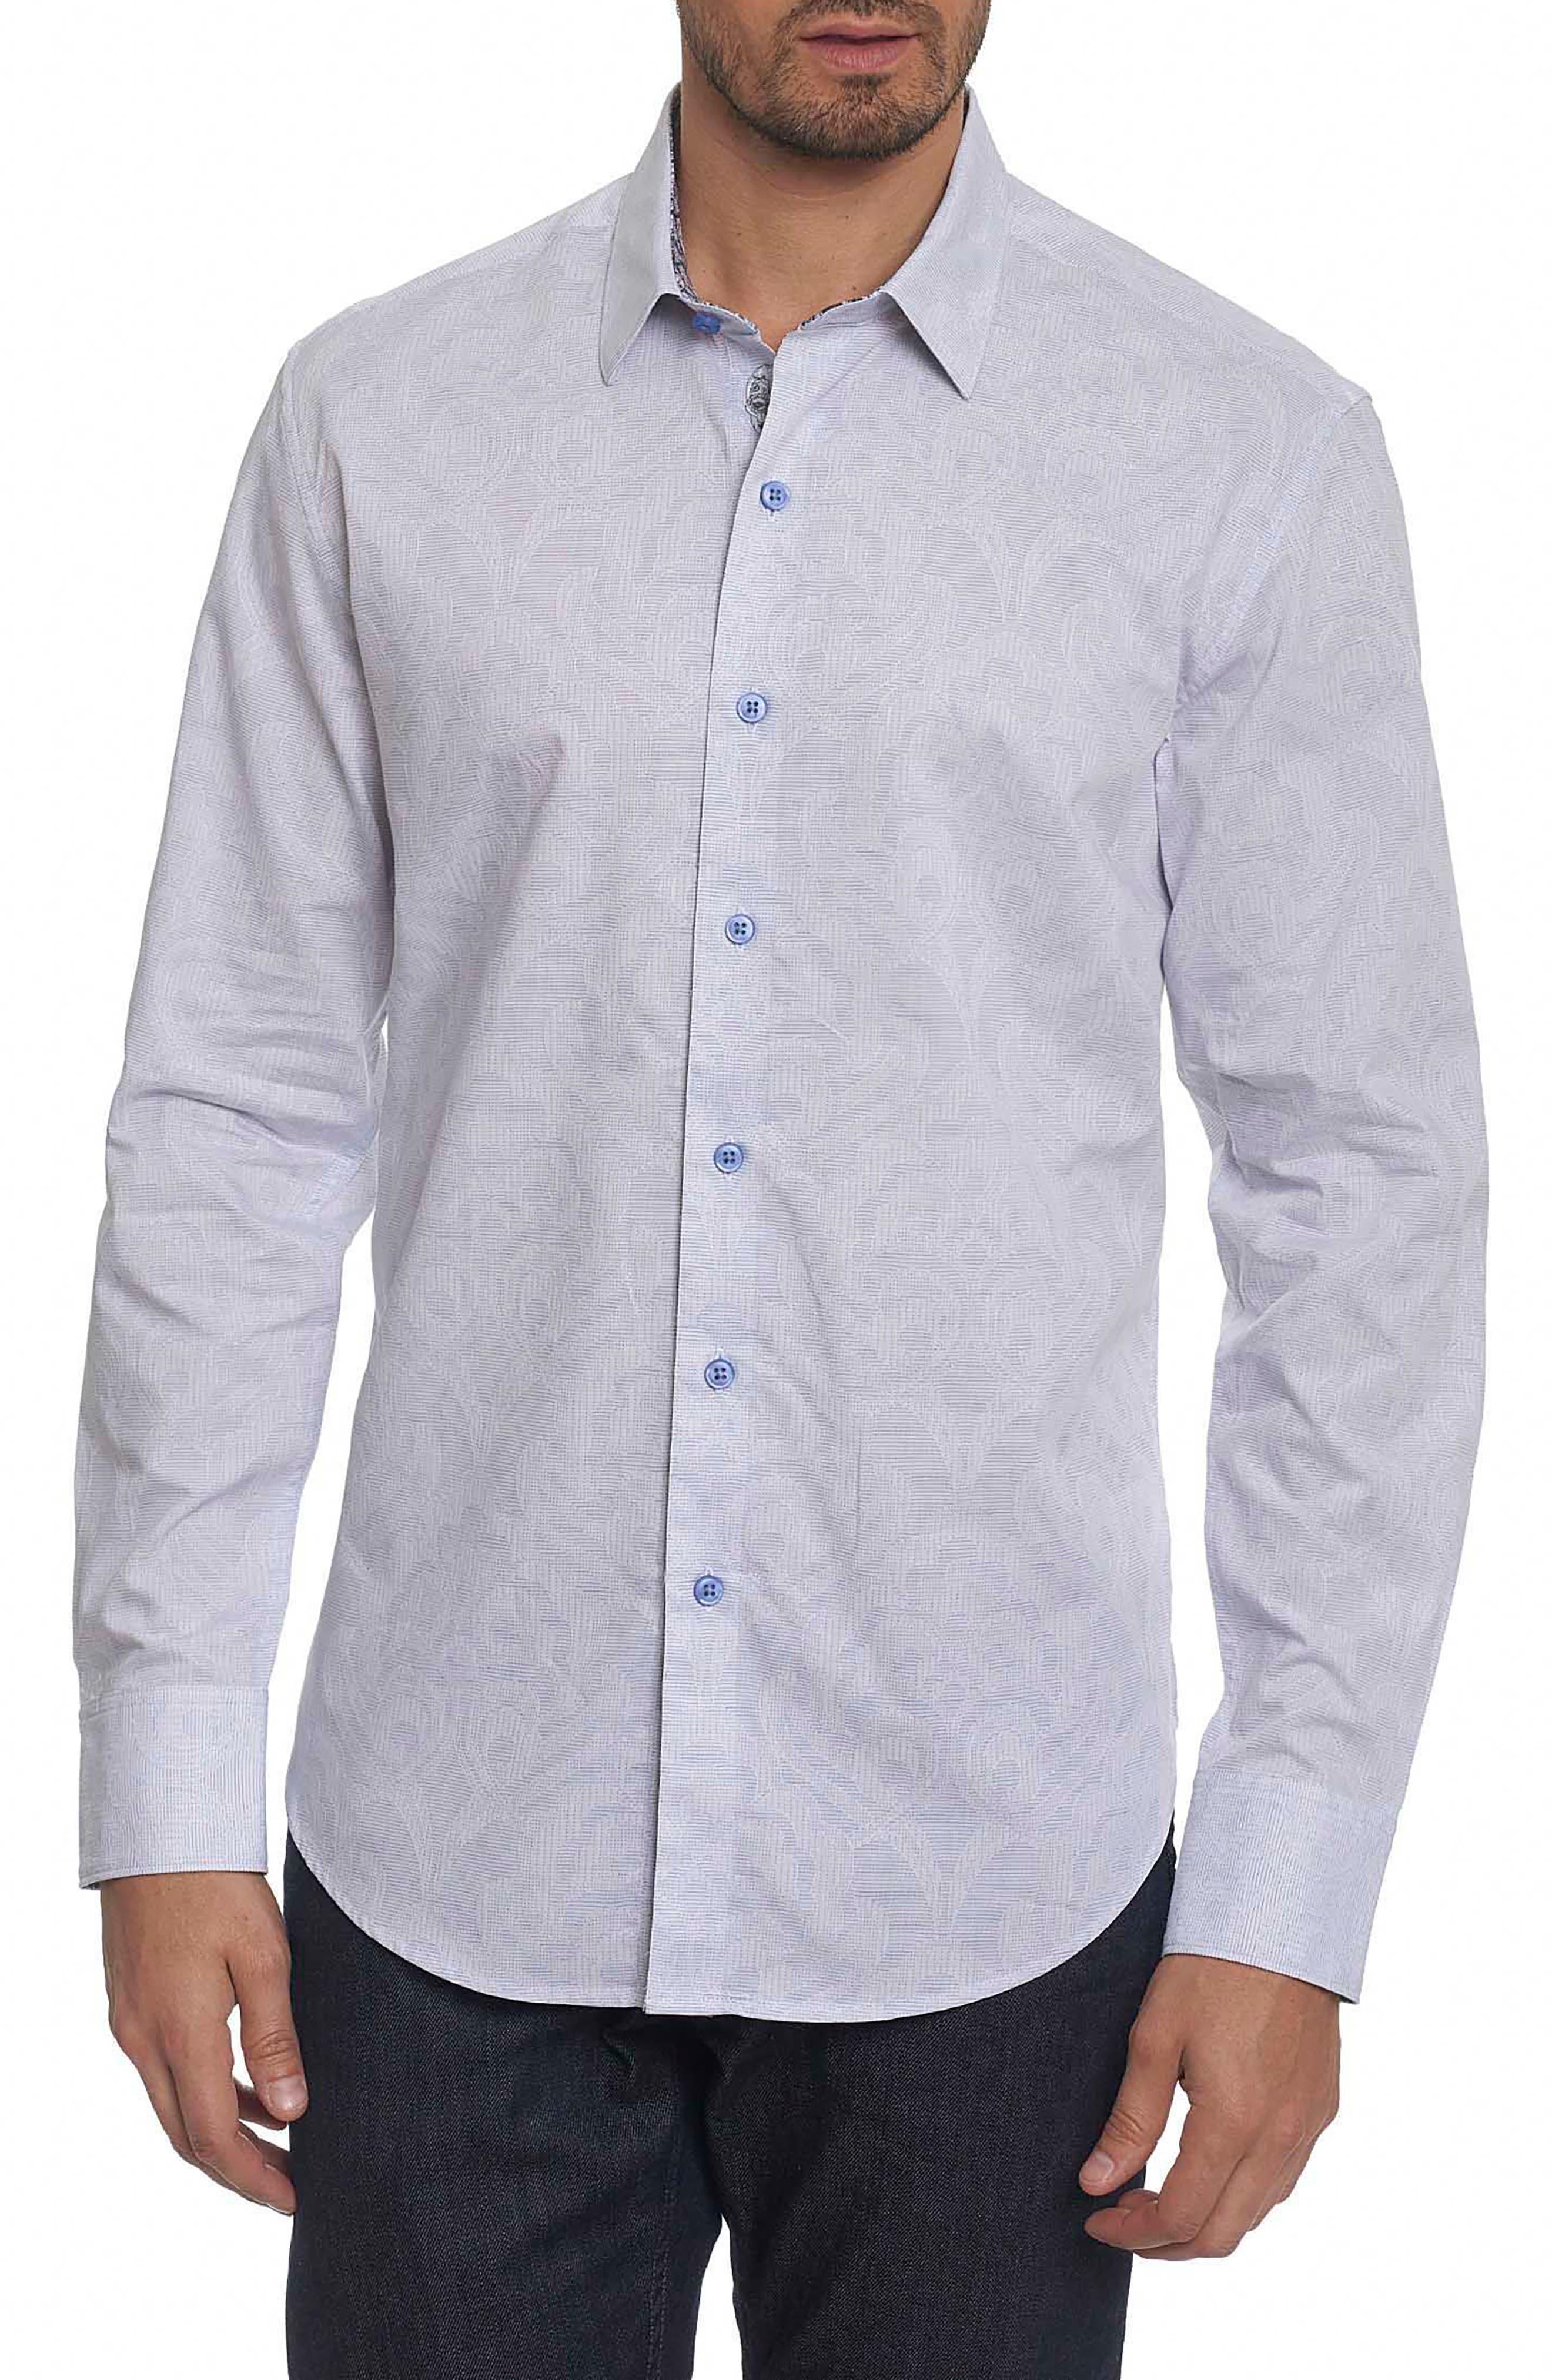 Alex Bay Classic Fit Sport Shirt,                             Main thumbnail 1, color,                             White